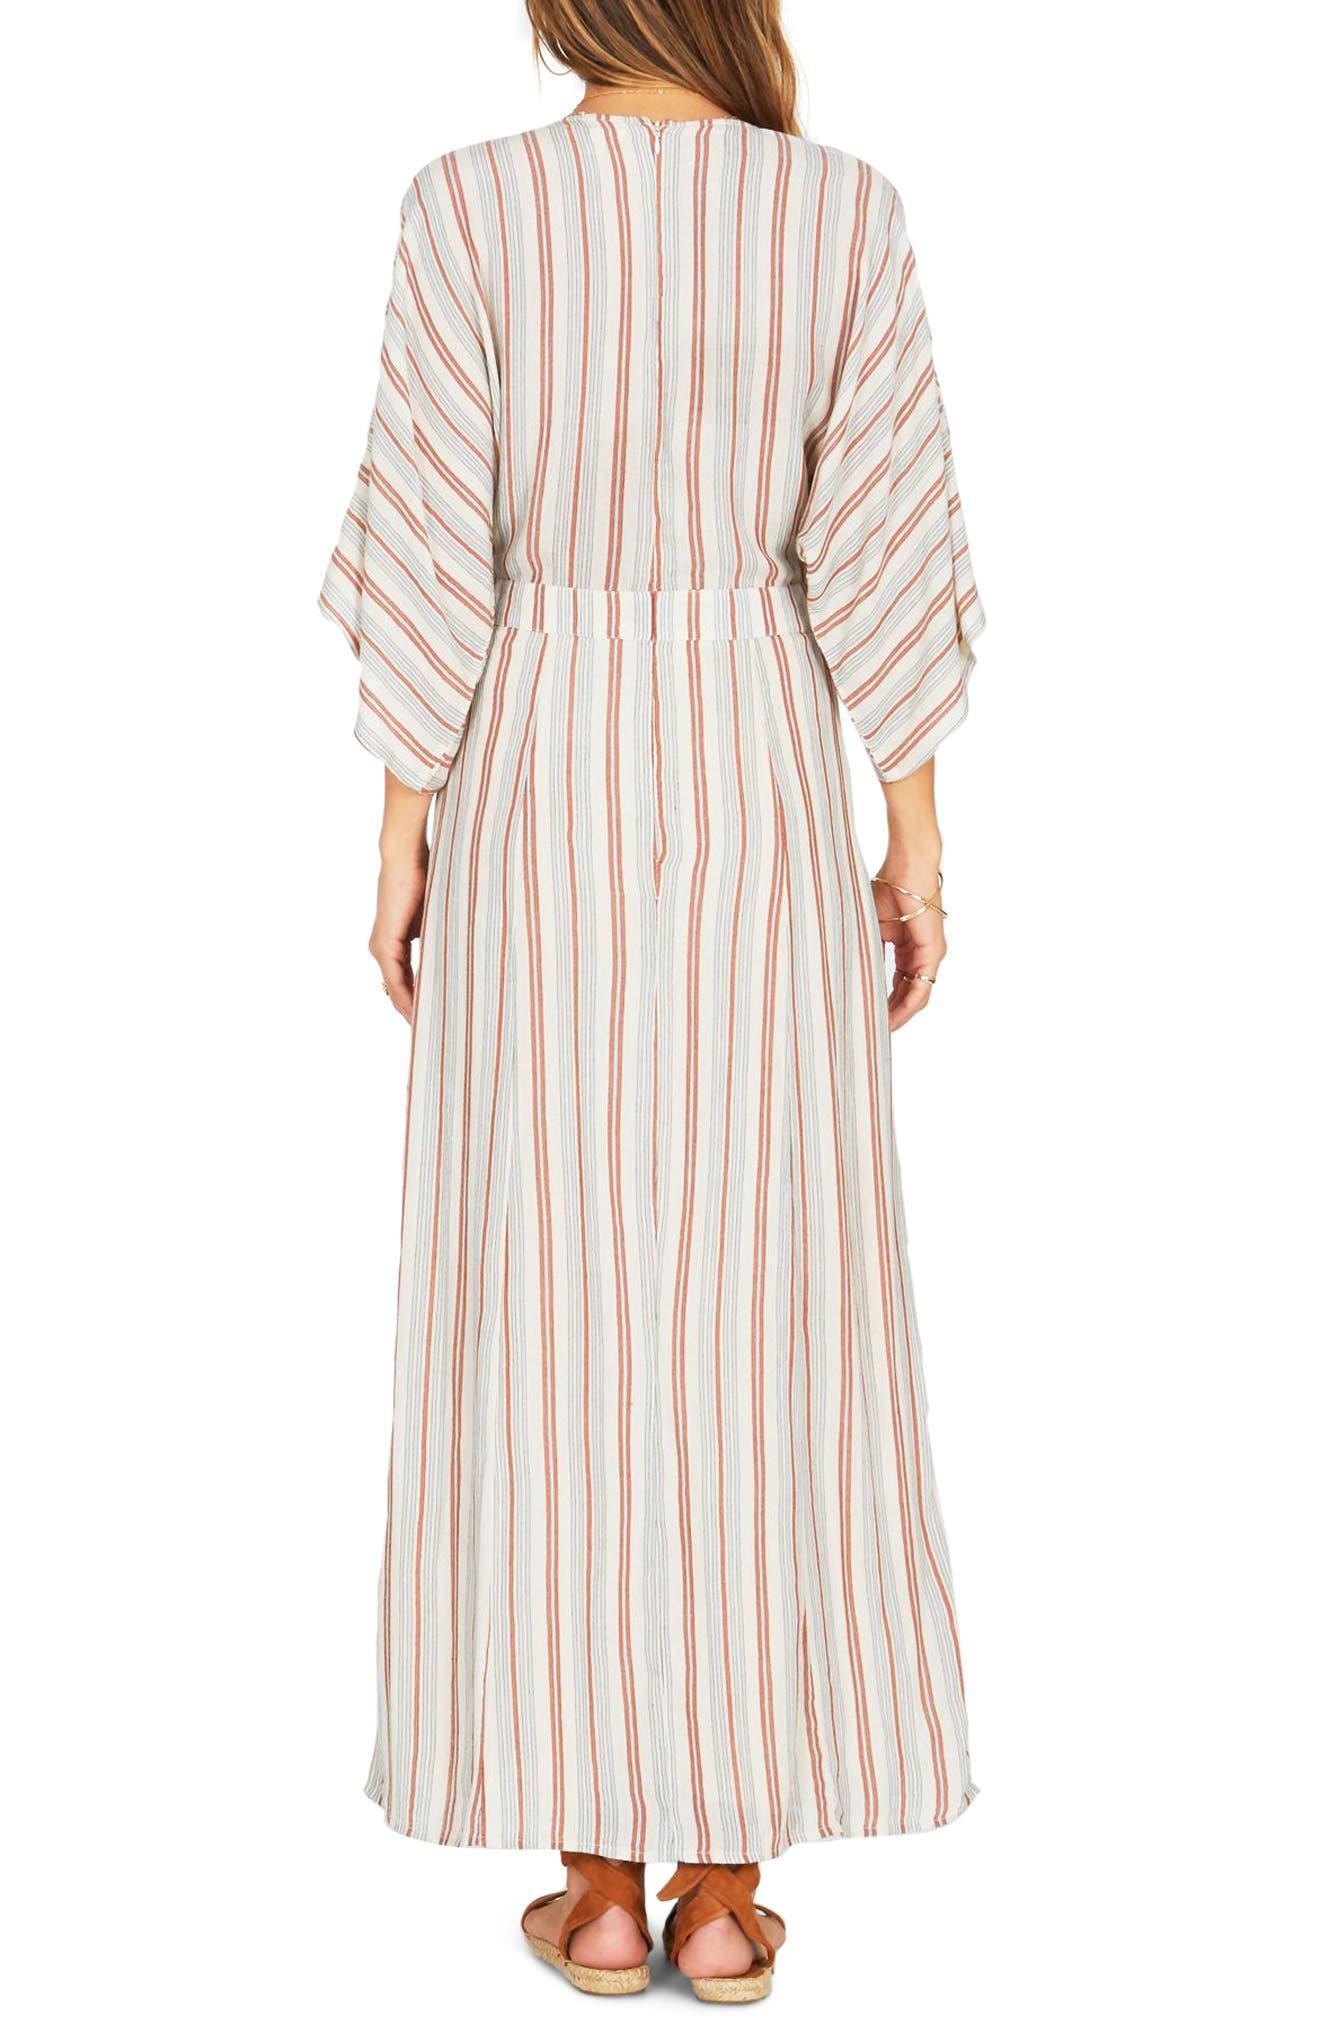 Forever & Day Stripe Maxi Dress,                             Alternate thumbnail 4, color,